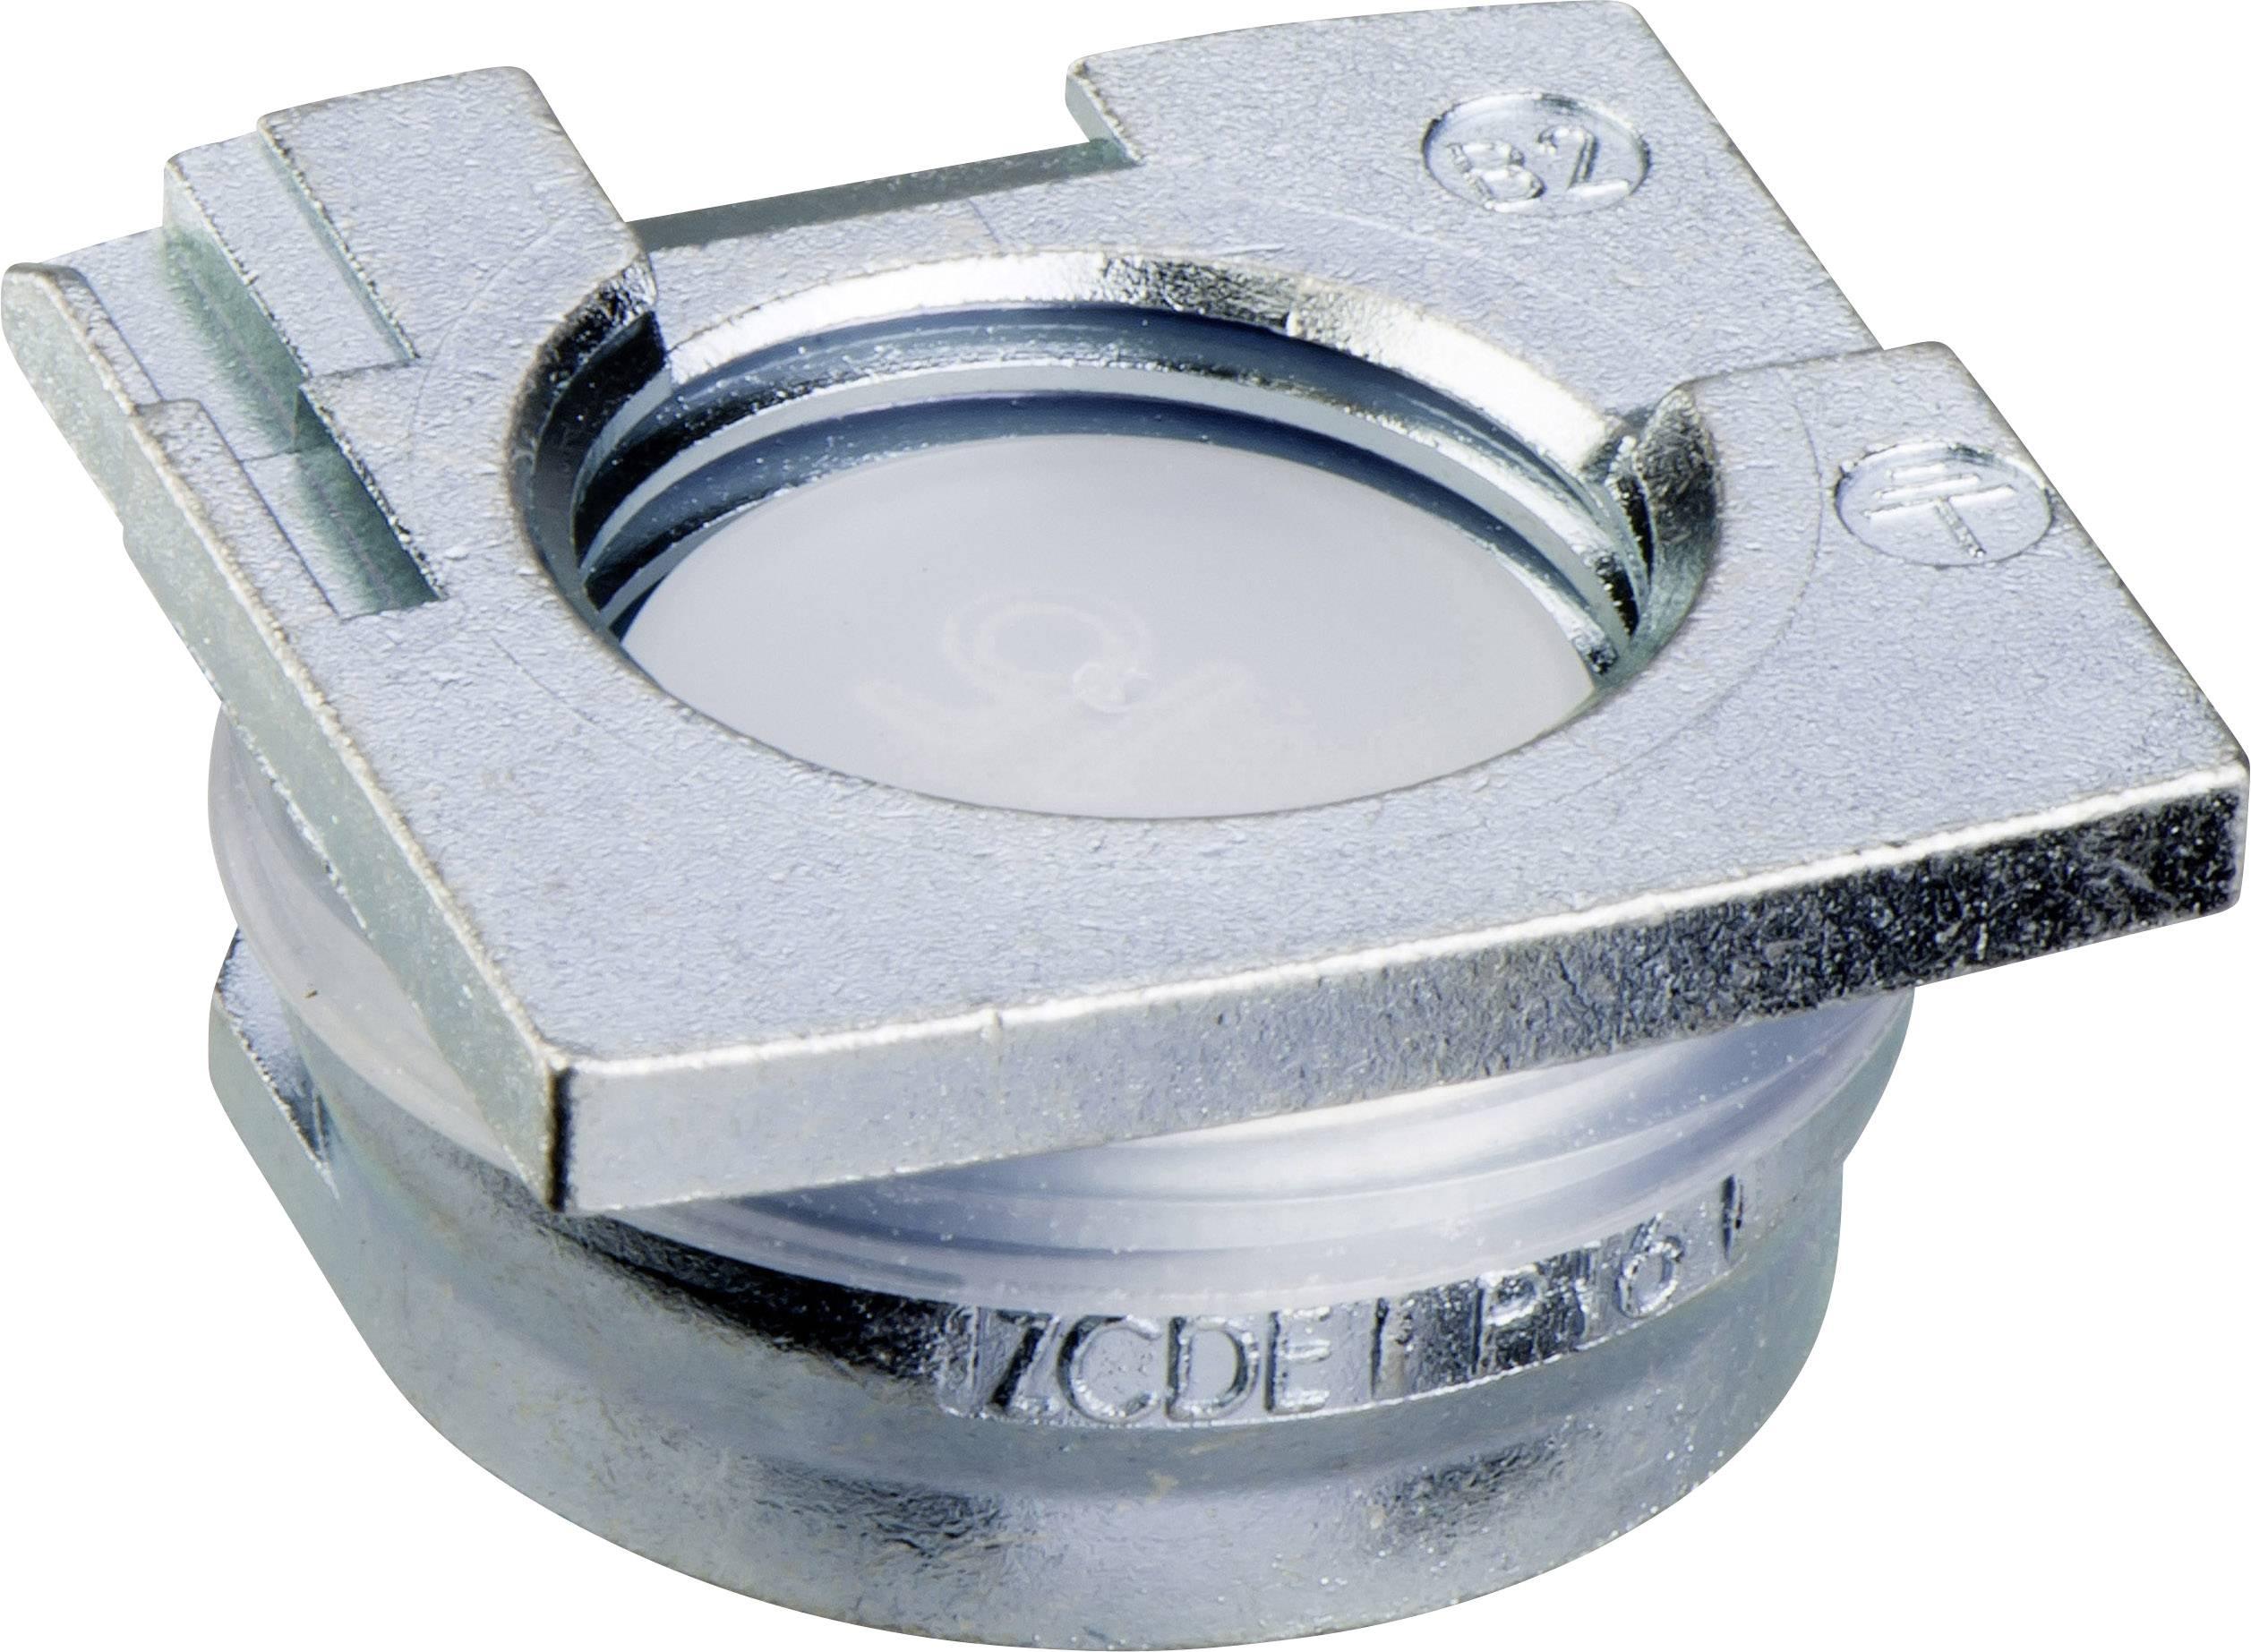 Destička pro kabelové průchodky Schneider Electric ZCDEP16, kov, 1 ks